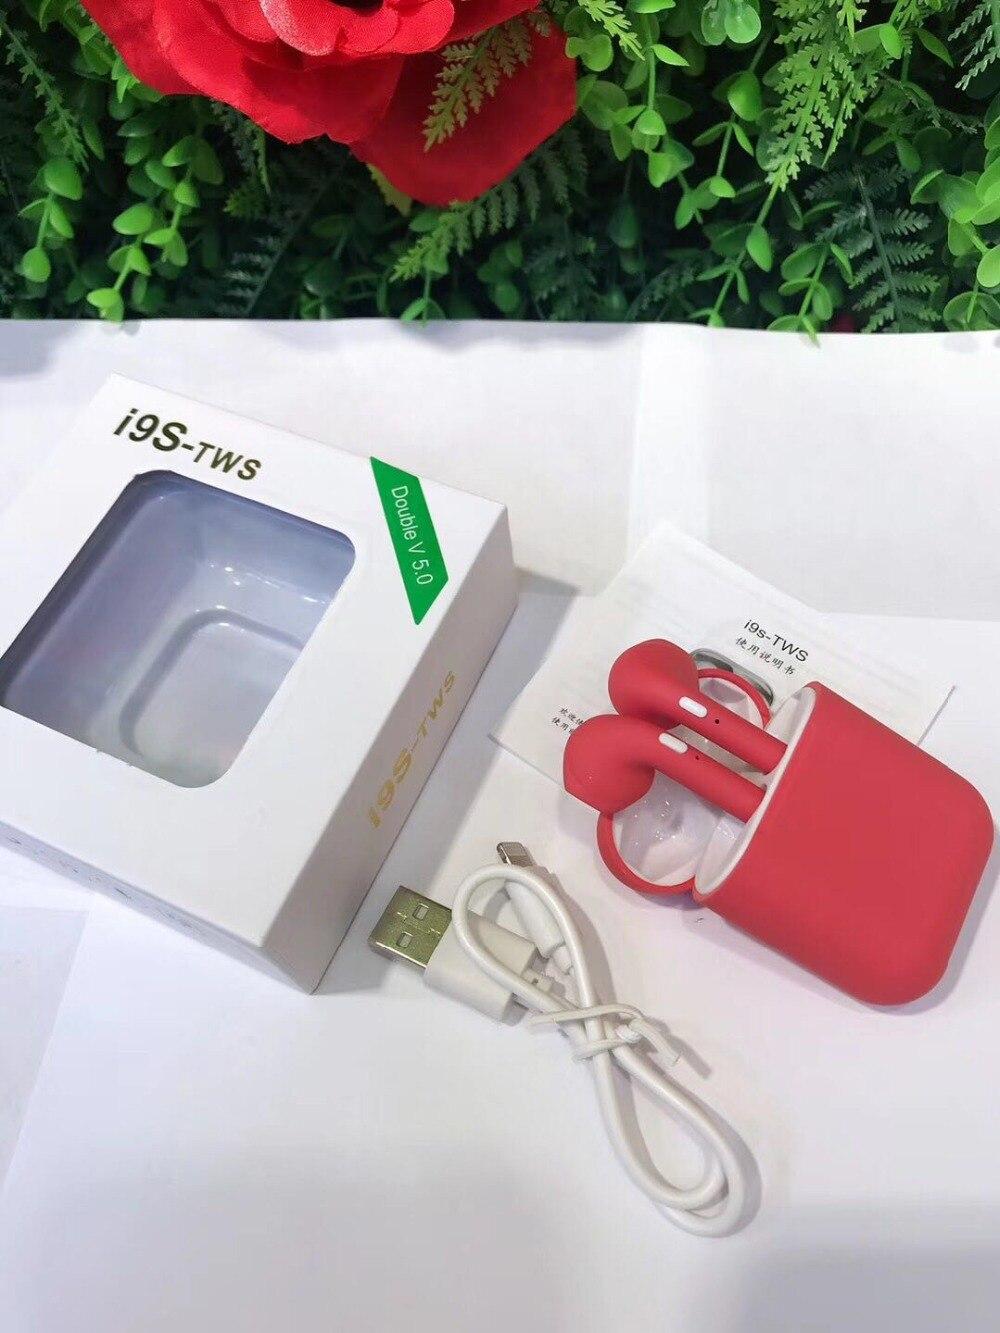 Colorful-TWS-I9s-TWS-earbuds-5-0-Bluetooth-earphones-Wireless-headset (4)